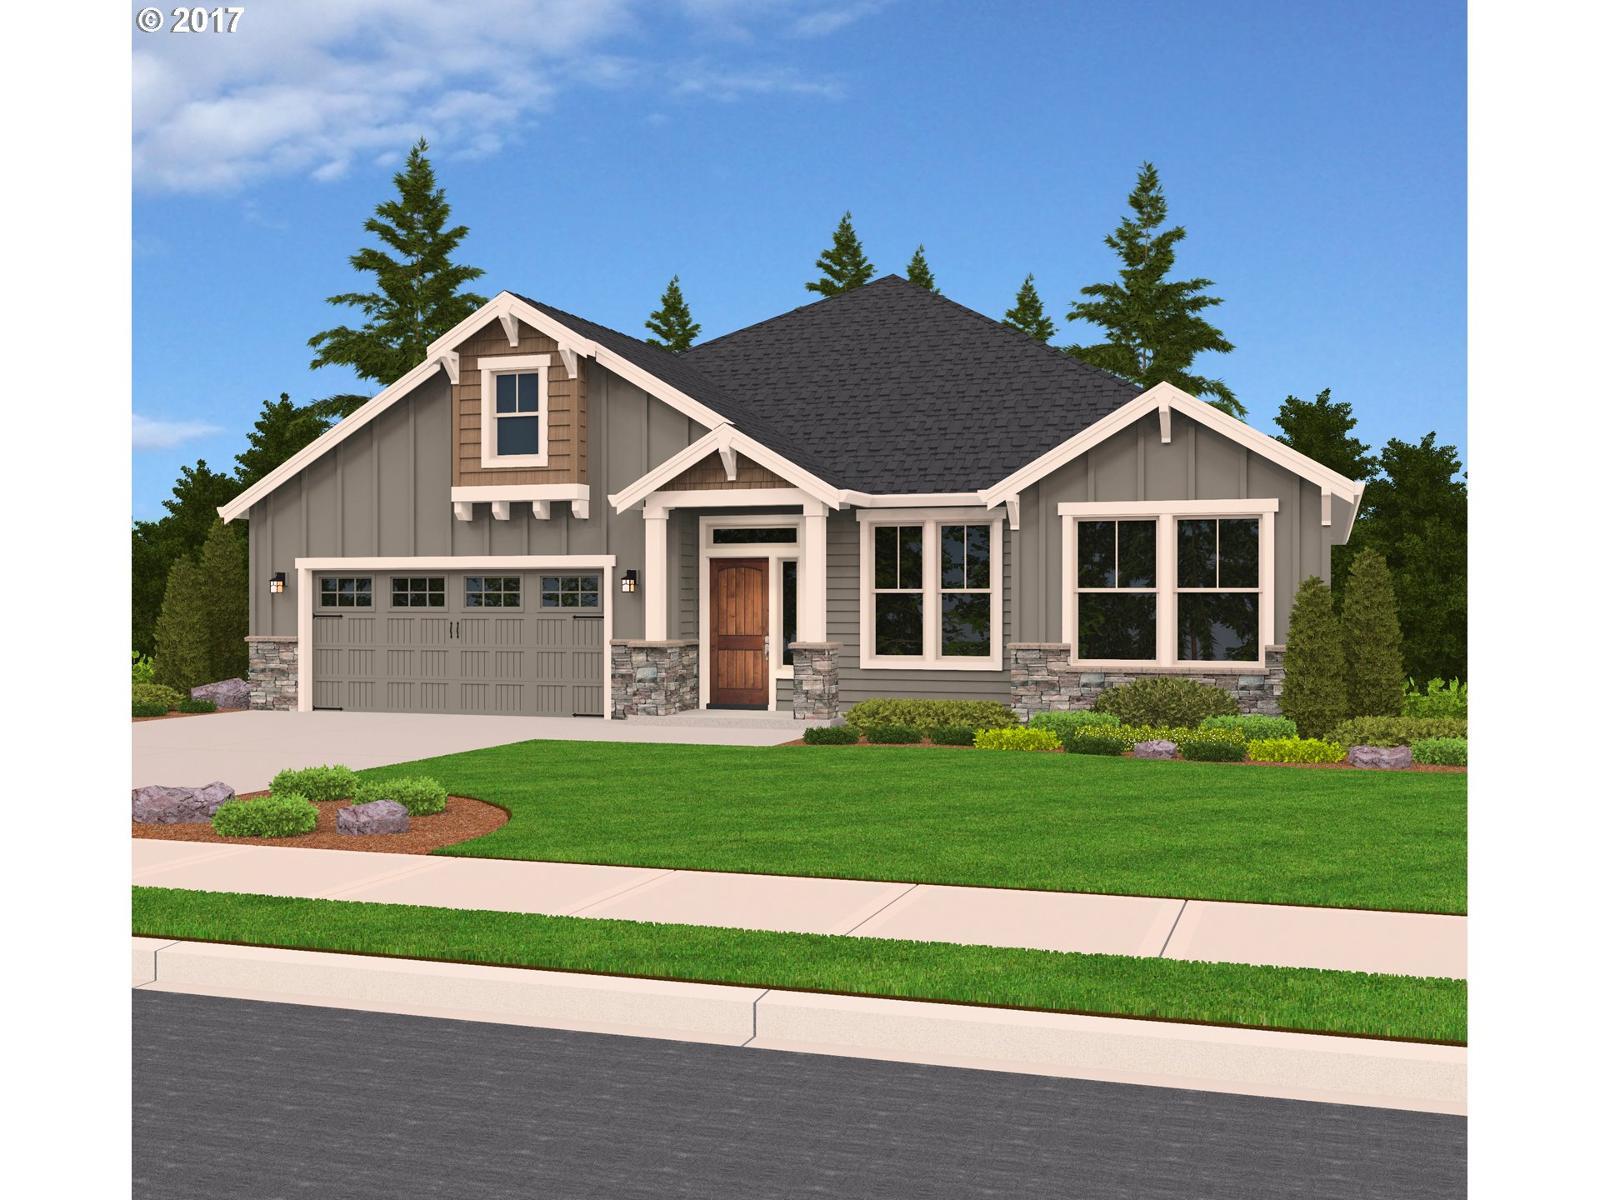 16810 ne 78th way vancouver wa mls 17248090 ziprealty for Vancouver washington home builders